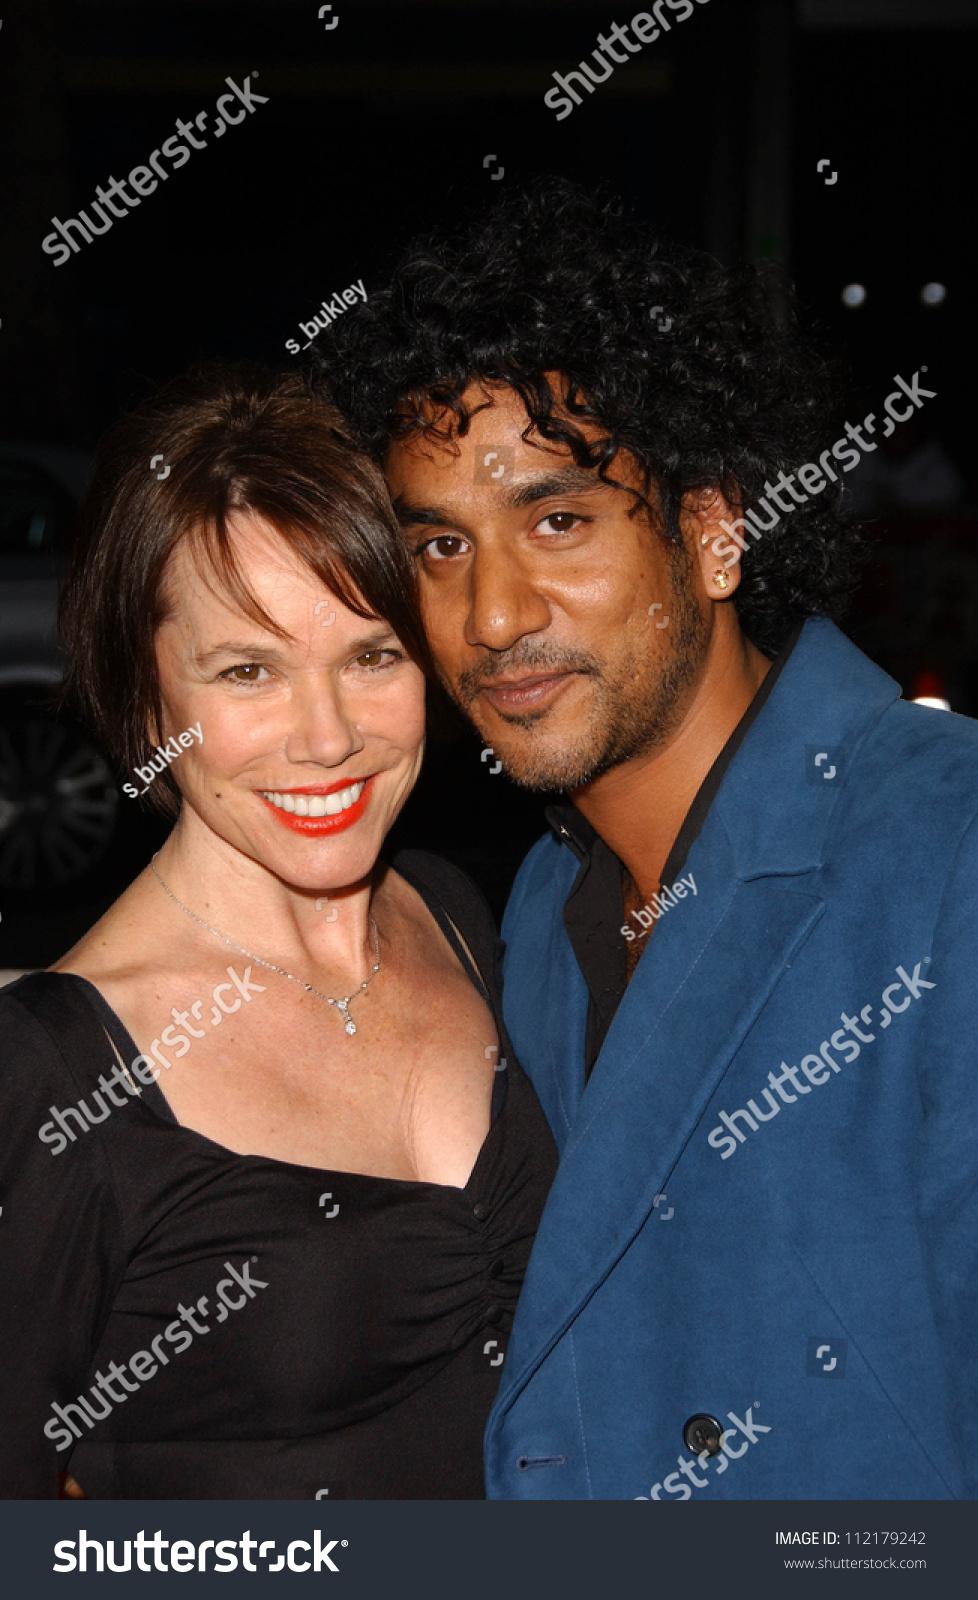 Barbara Hershey And Naveen Andrews At The Los Angeles ...